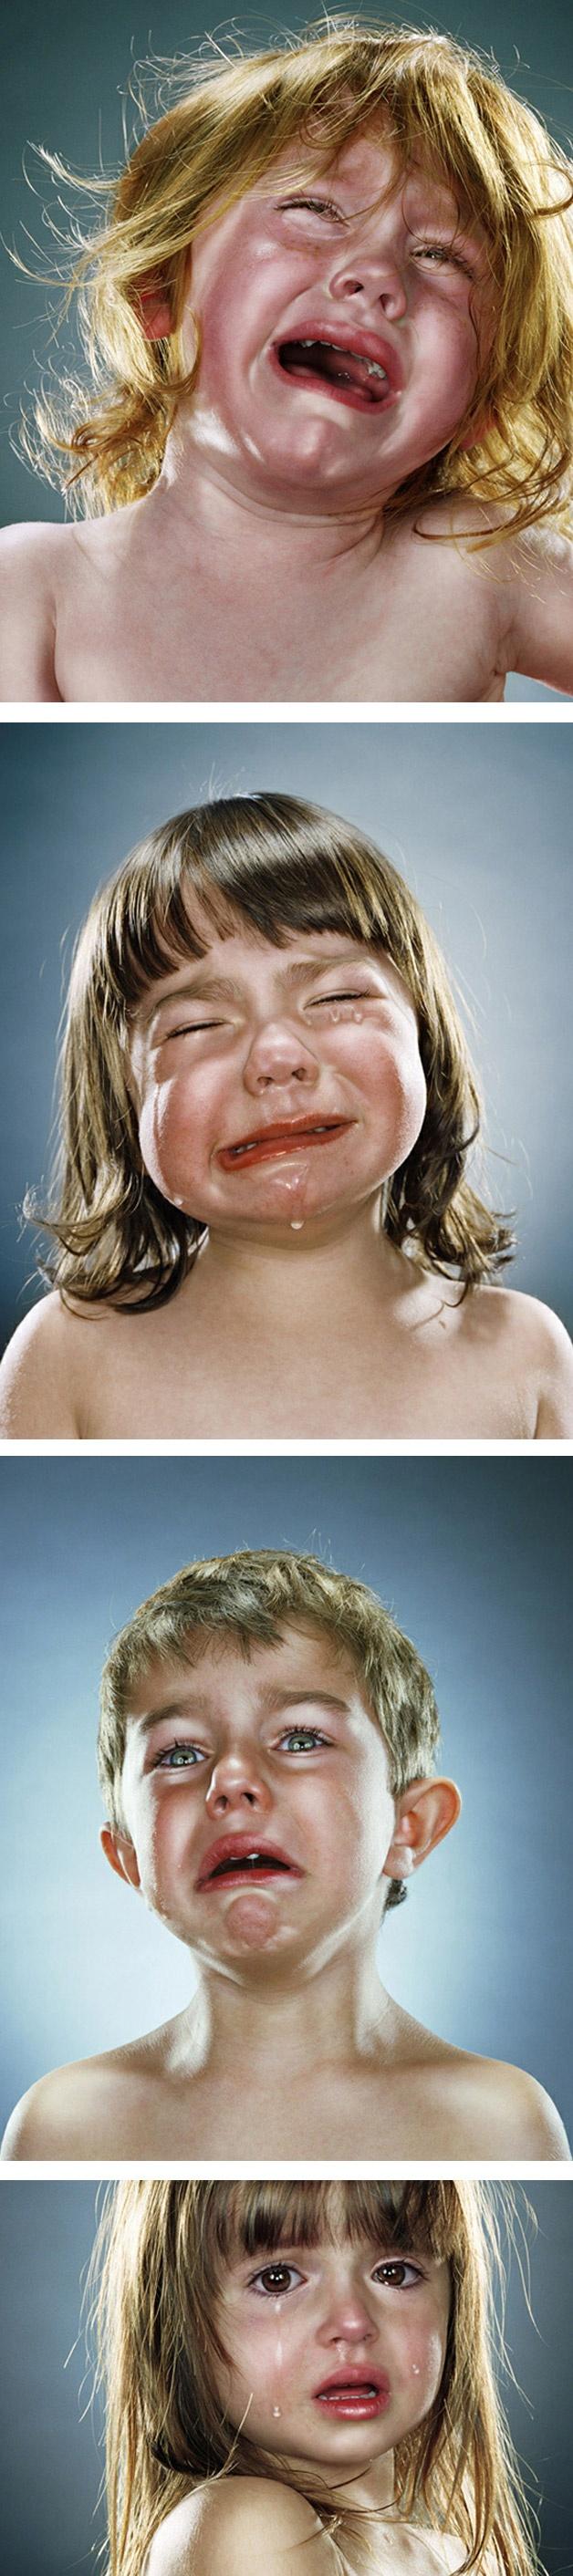 I cry - Jill Greenberg